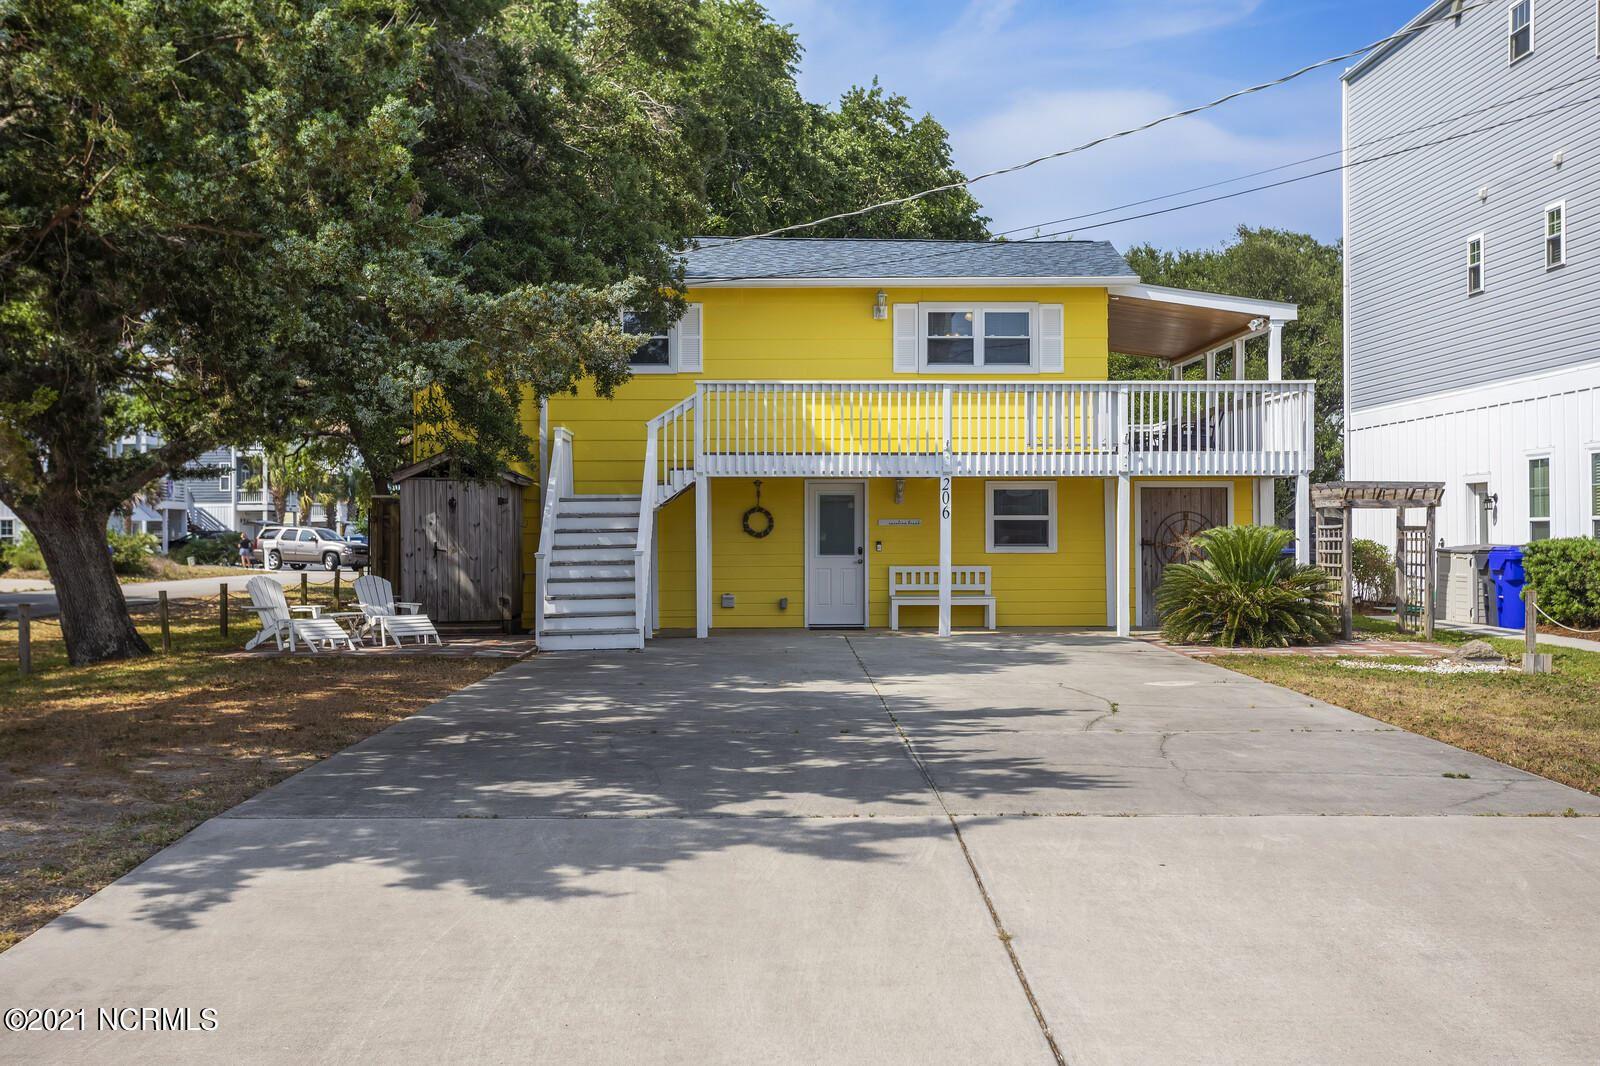 Photo of 206 South Carolina Avenue, Carolina Beach, NC 28428 (MLS # 100273854)